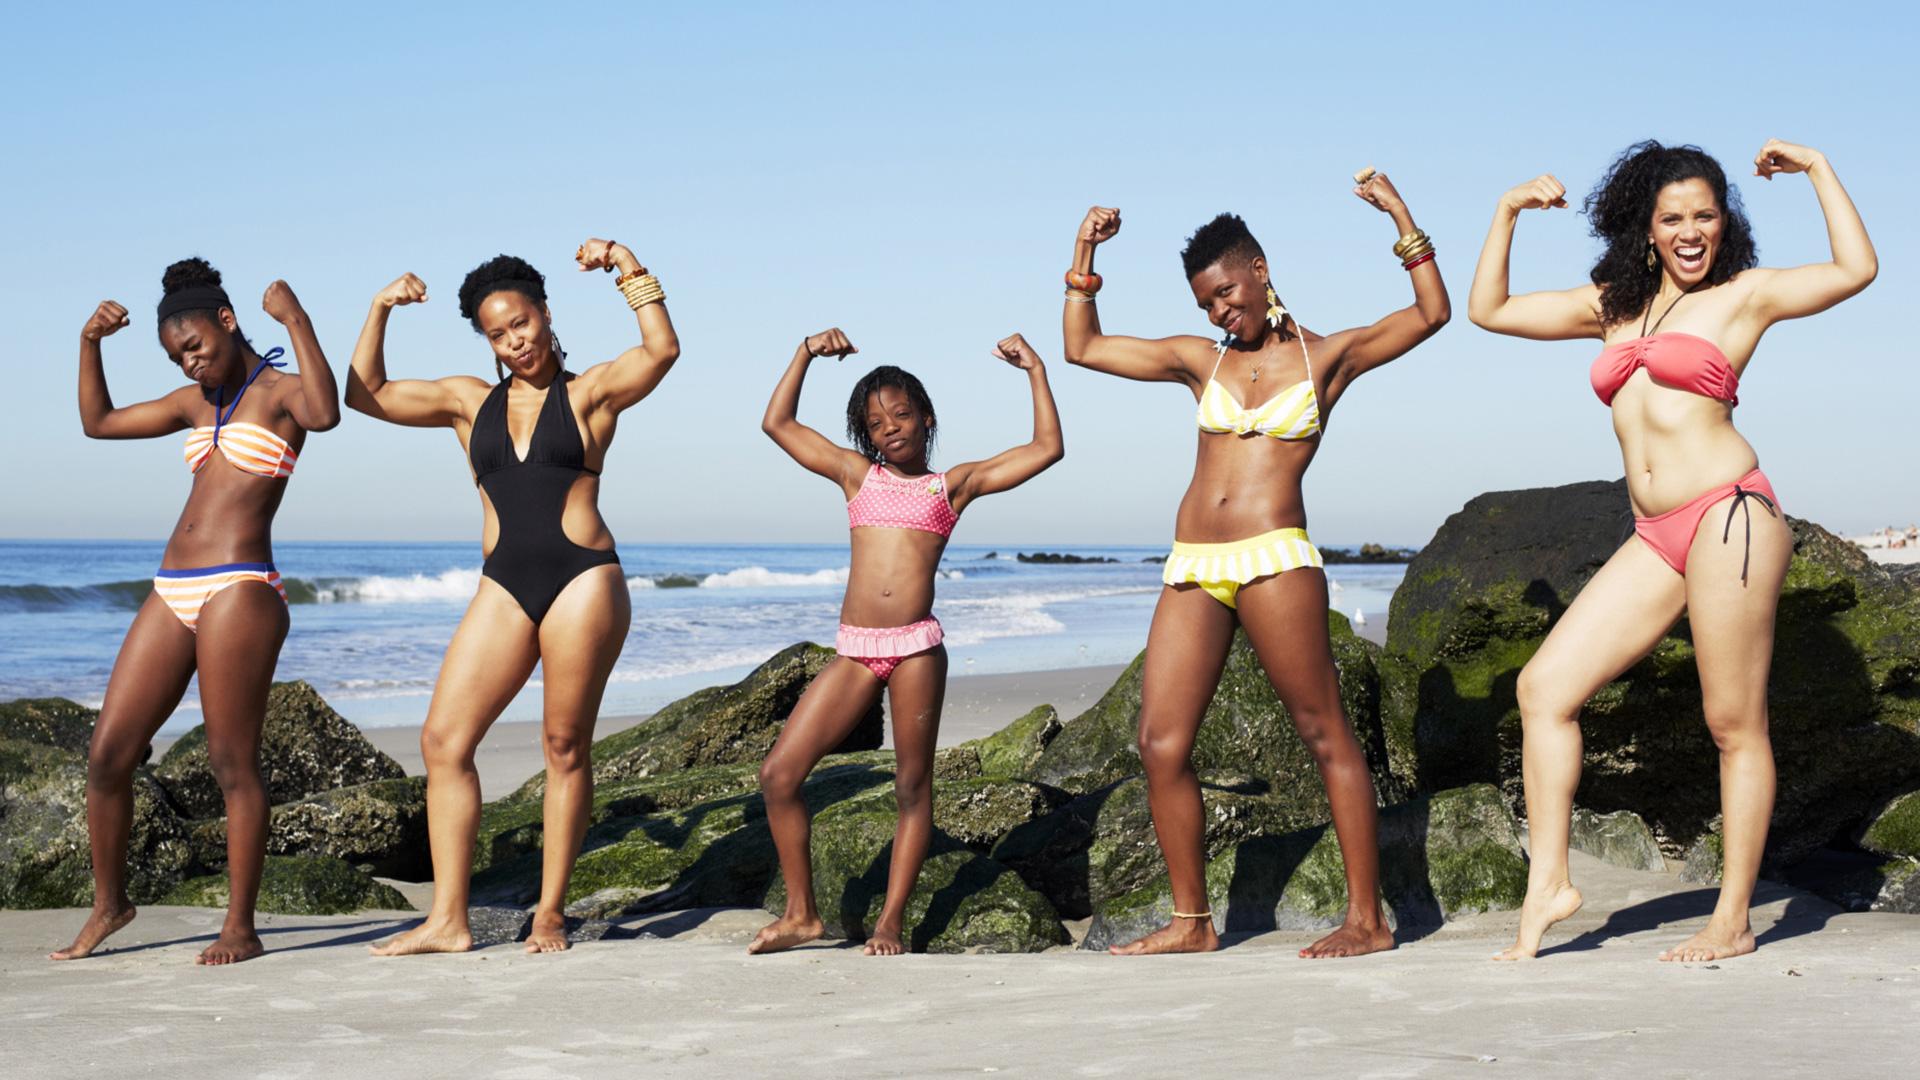 Women striking power pose on beach | Sheknows.com